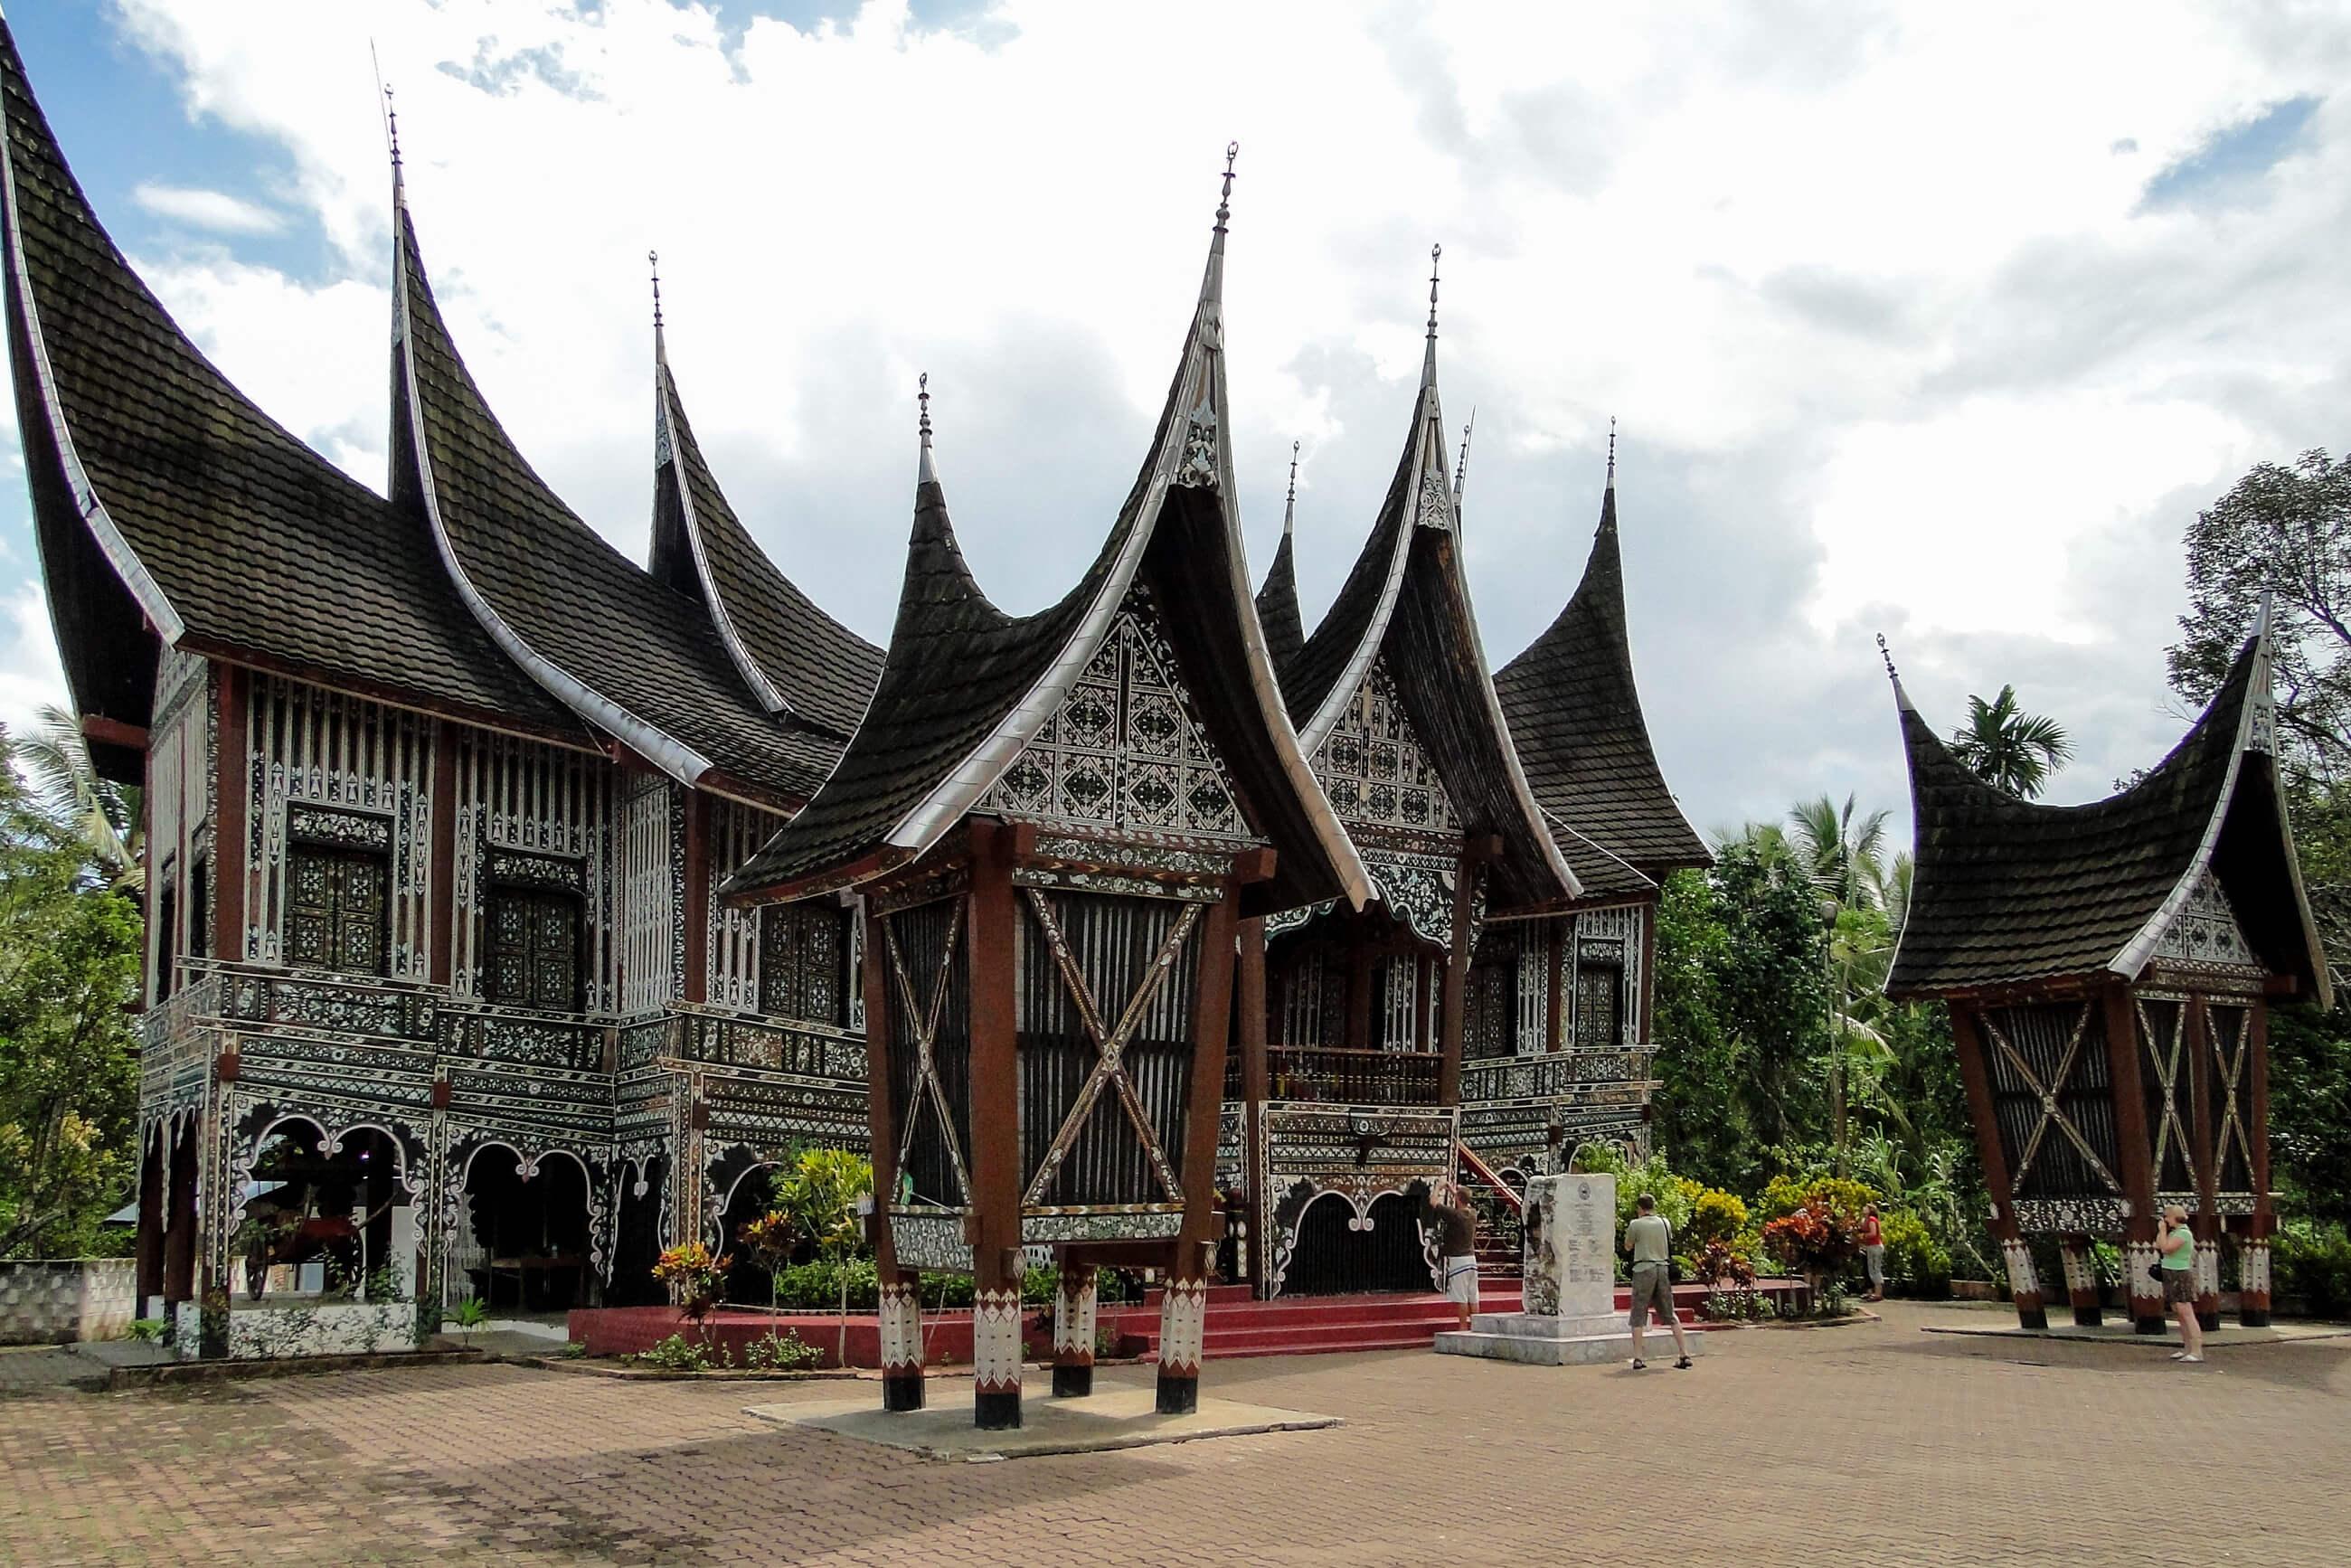 https://bubo.sk/uploads/galleries/7542/archiv_indonezia_sumatra_dsc02110-7.jpg